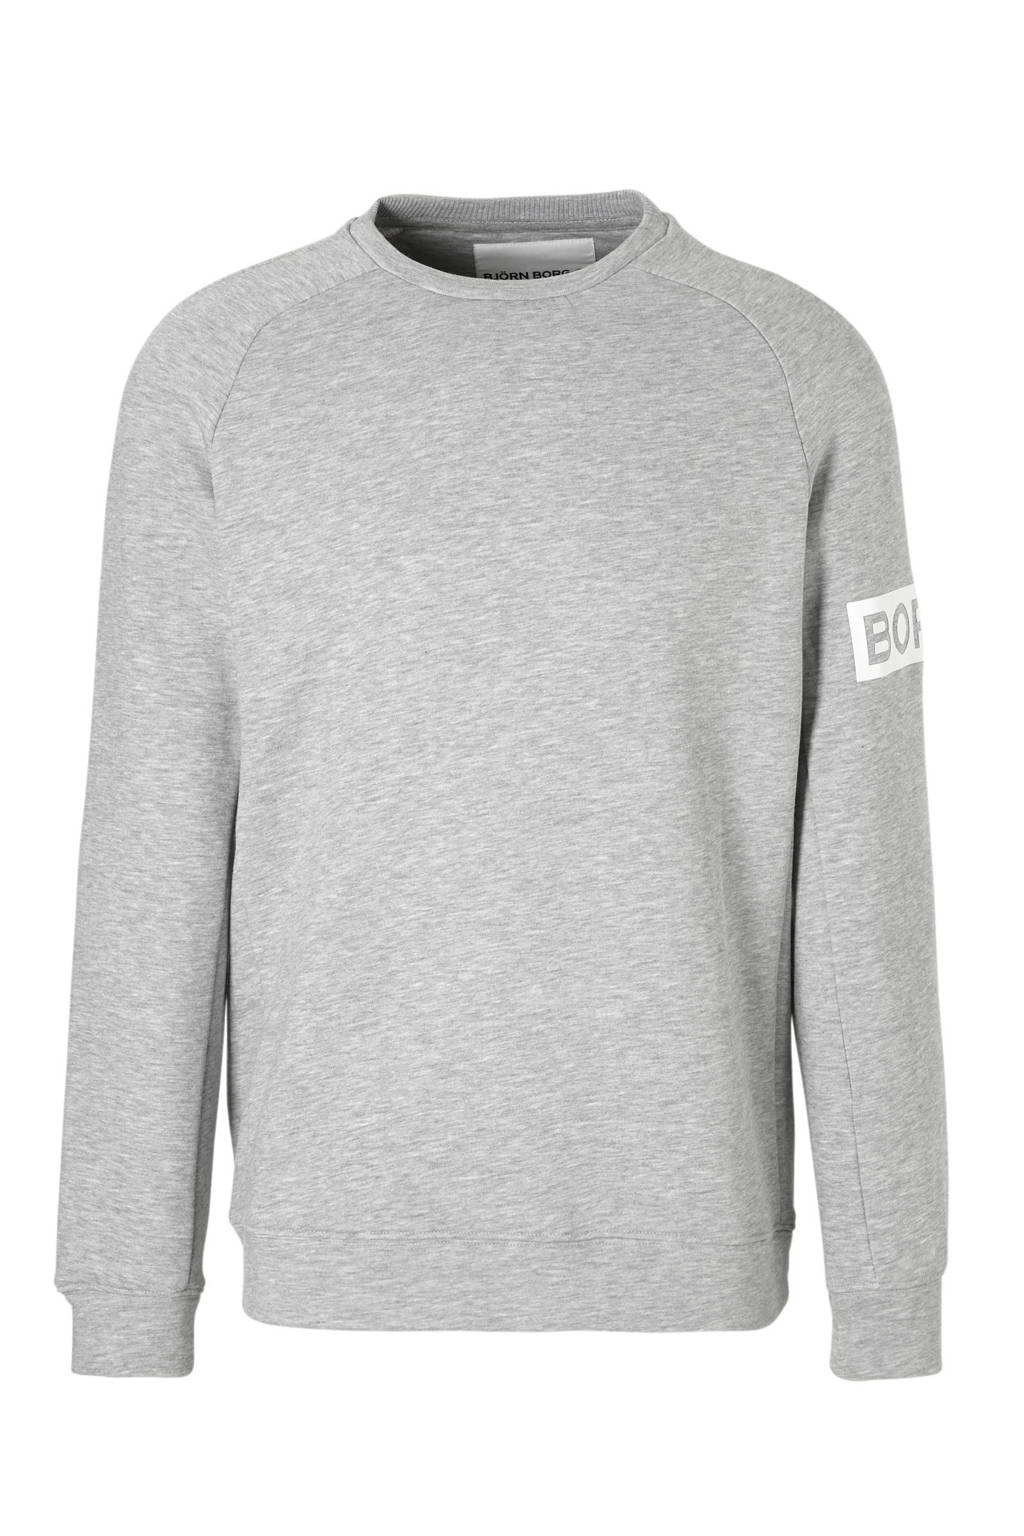 Björn Borg   Sportsweater grijs, Grijs/wit